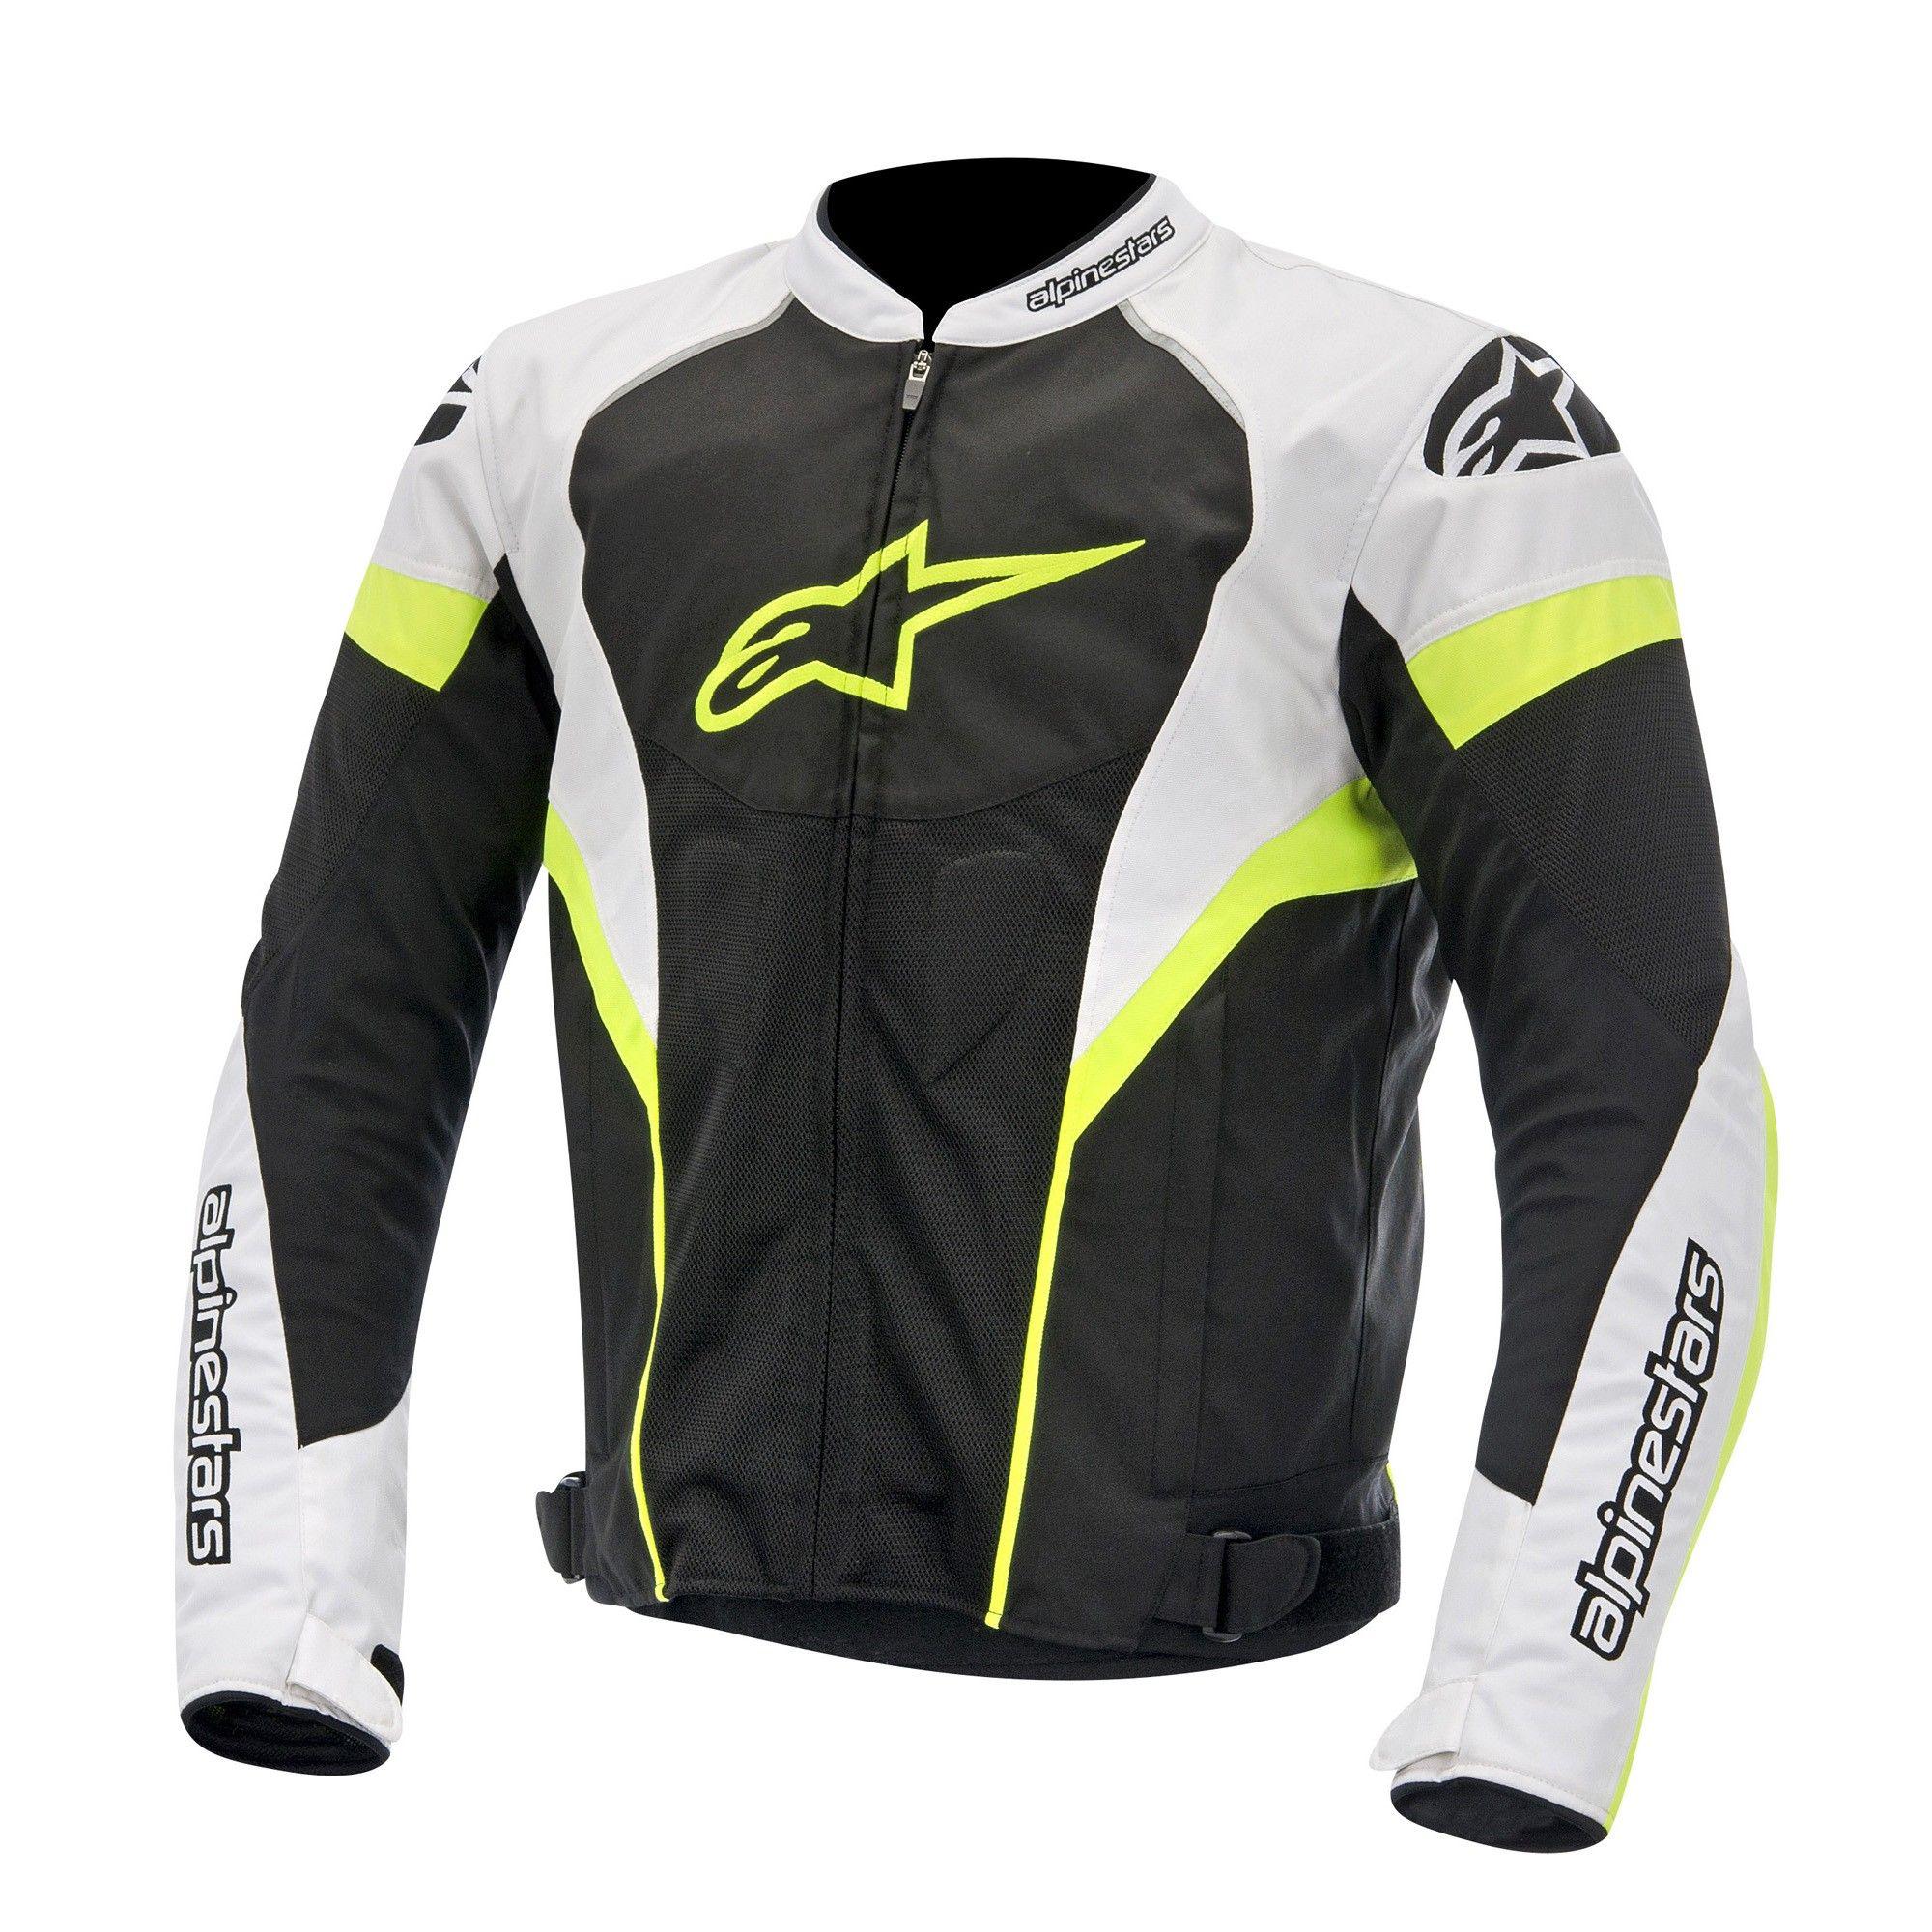 TGP Plus R Air Jacket Alpinestars Jackets, Bike jacket